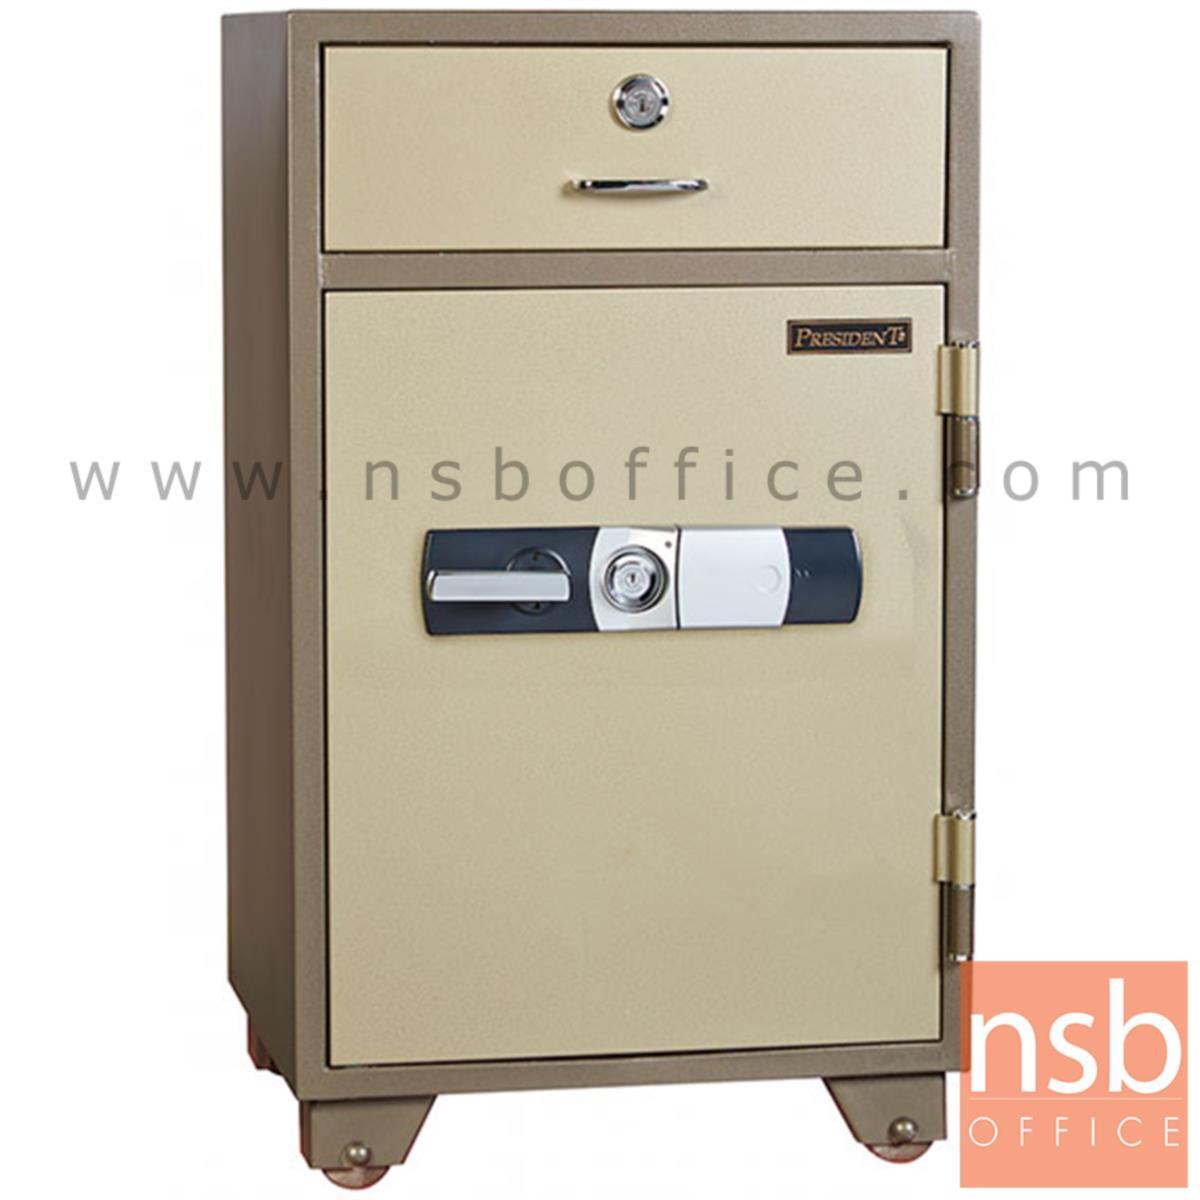 F05A075:ตู้เซฟนิรภัยชนิดดิจิตอล รุ่น PRESIDENT-ND-150D  มี 2 กุญแจ 1 รหัส (รหัสใช้กดหน้าตู้)